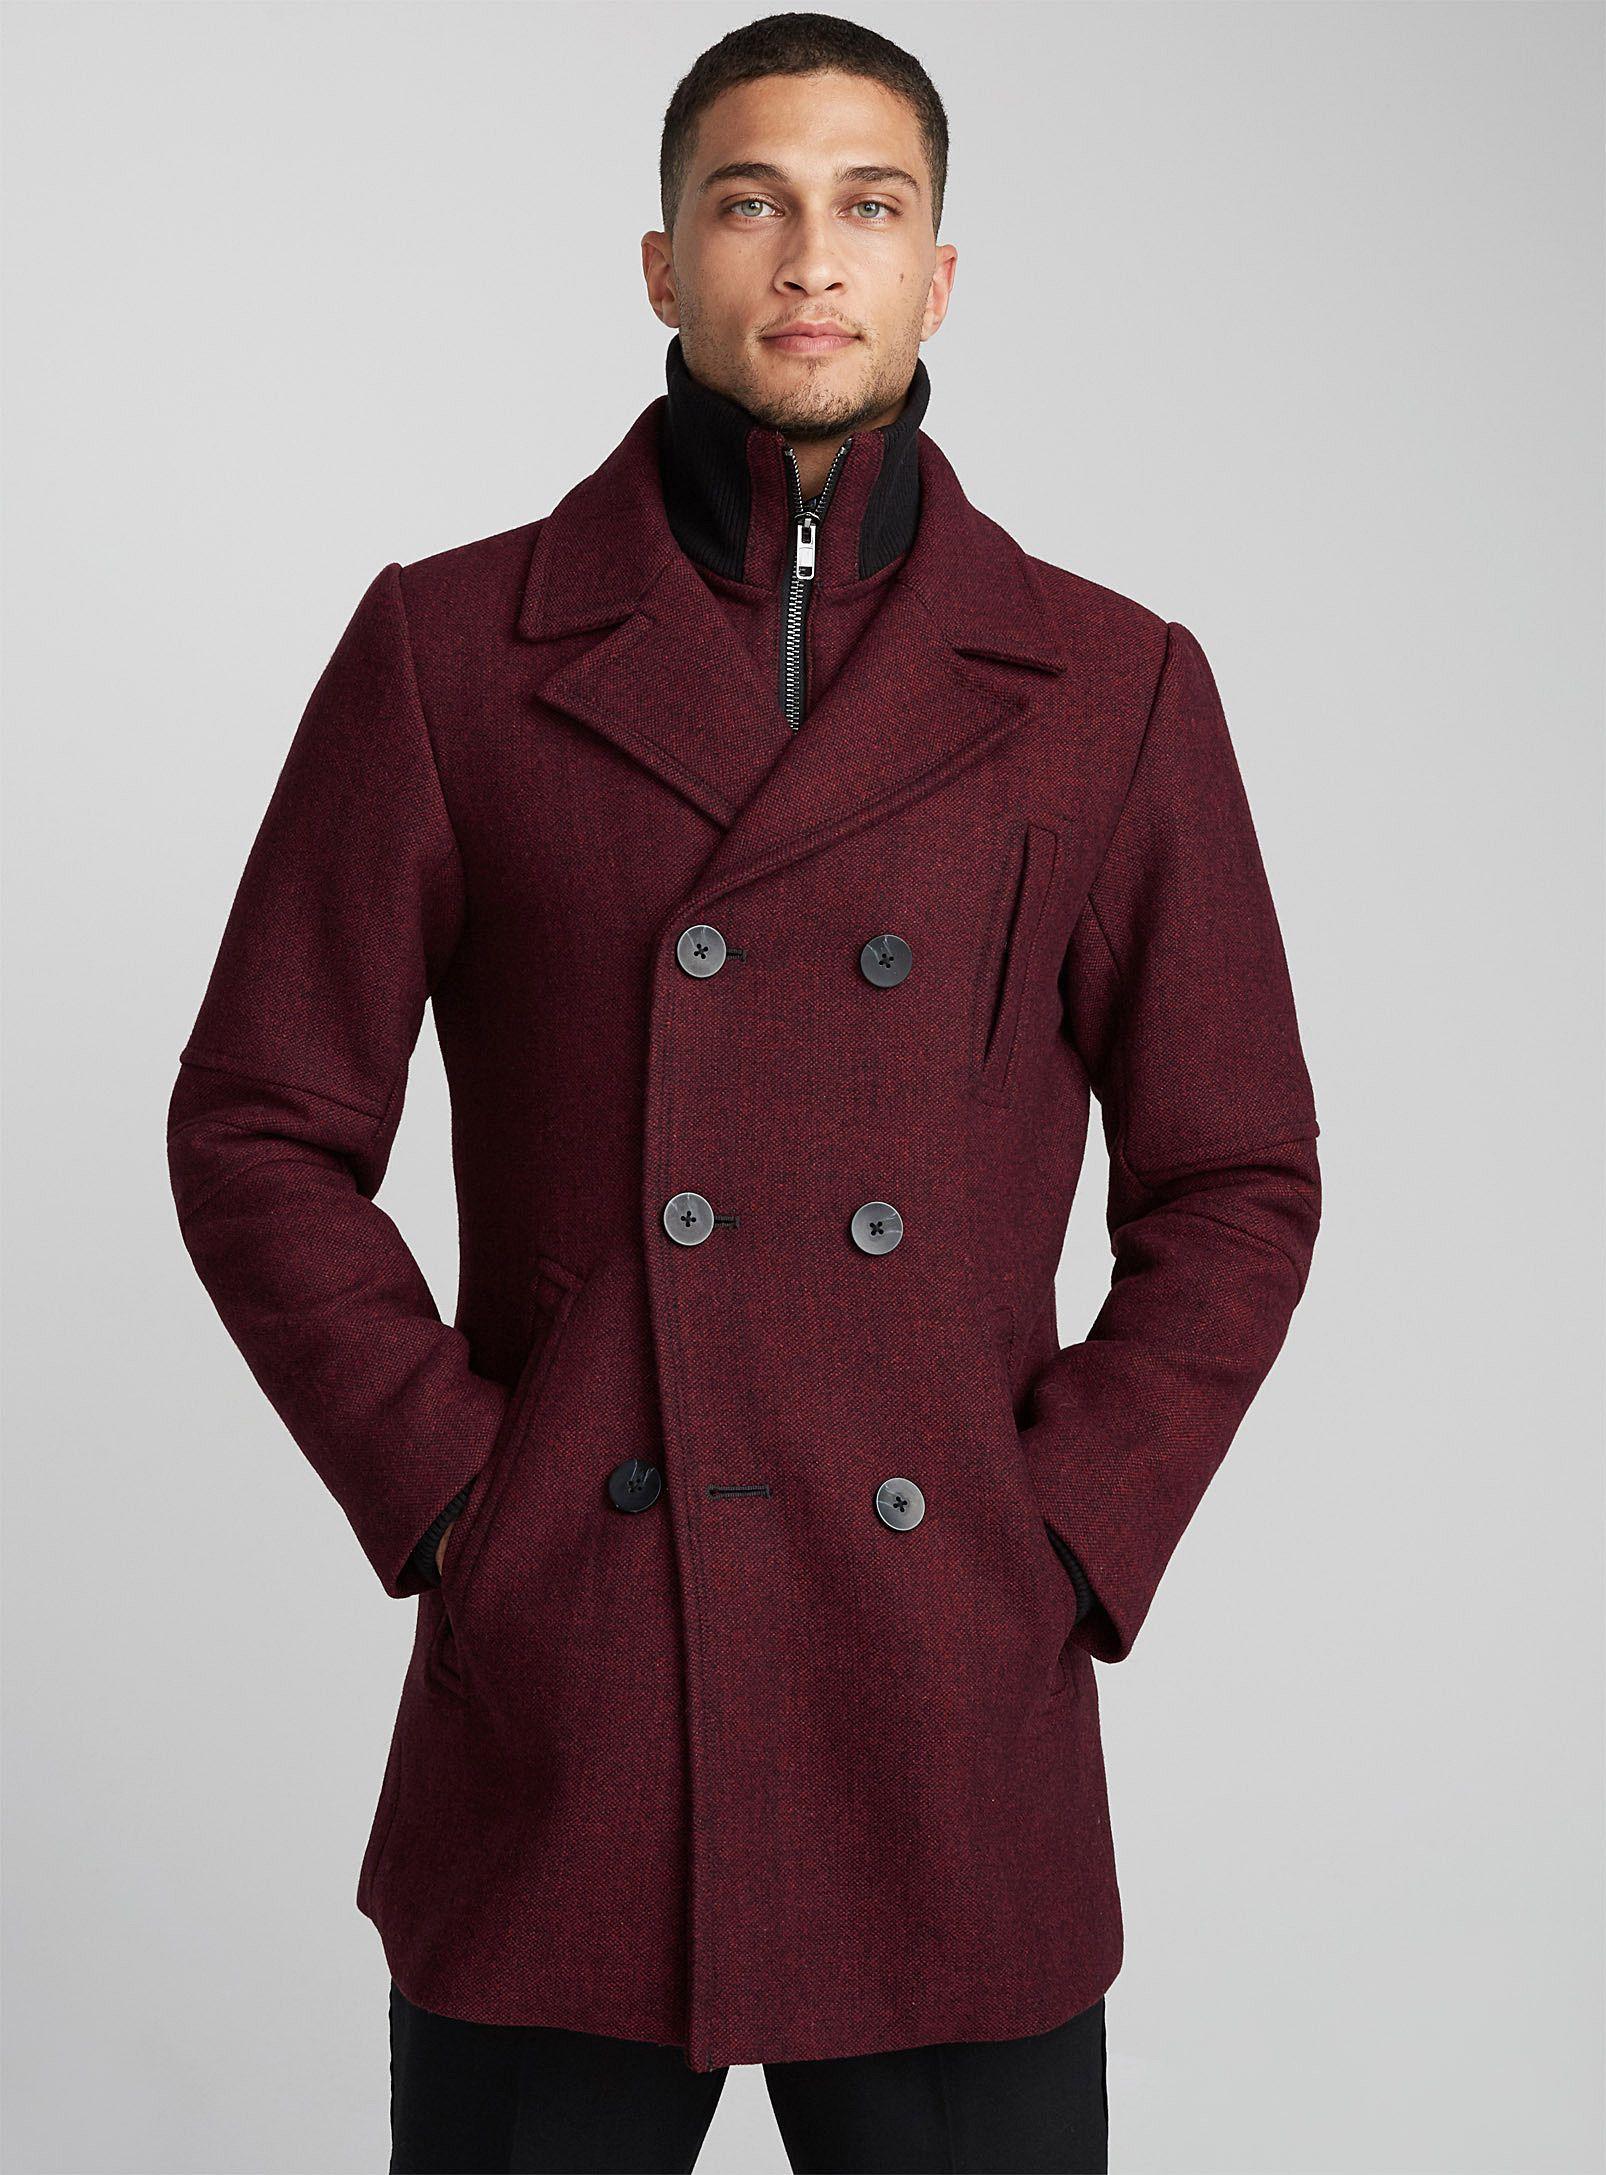 Heathered double-collar peacoat   Le 31   Shop Mens Wool Coats, Trench  Coats   Pea Coats in Canada   Simons 3dcad5ac14